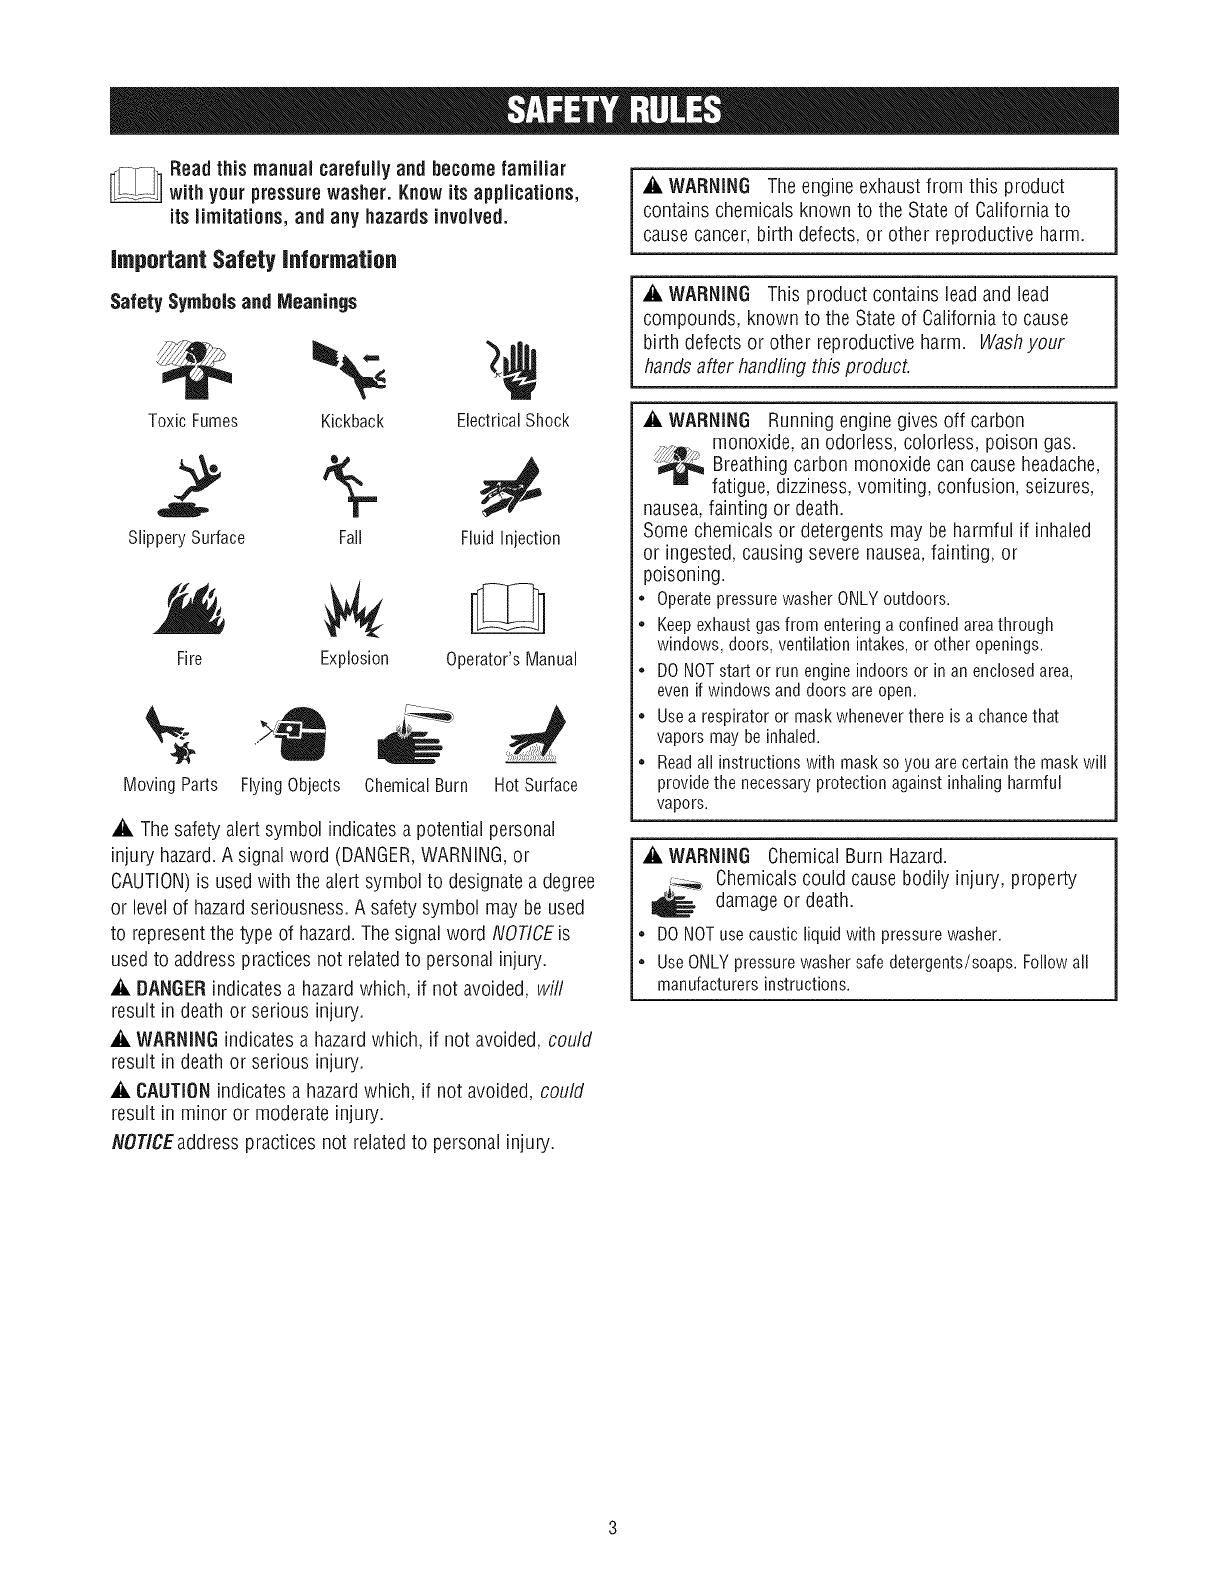 Craftsman 580752500 User Manual PRESSURE WASHER Manuals